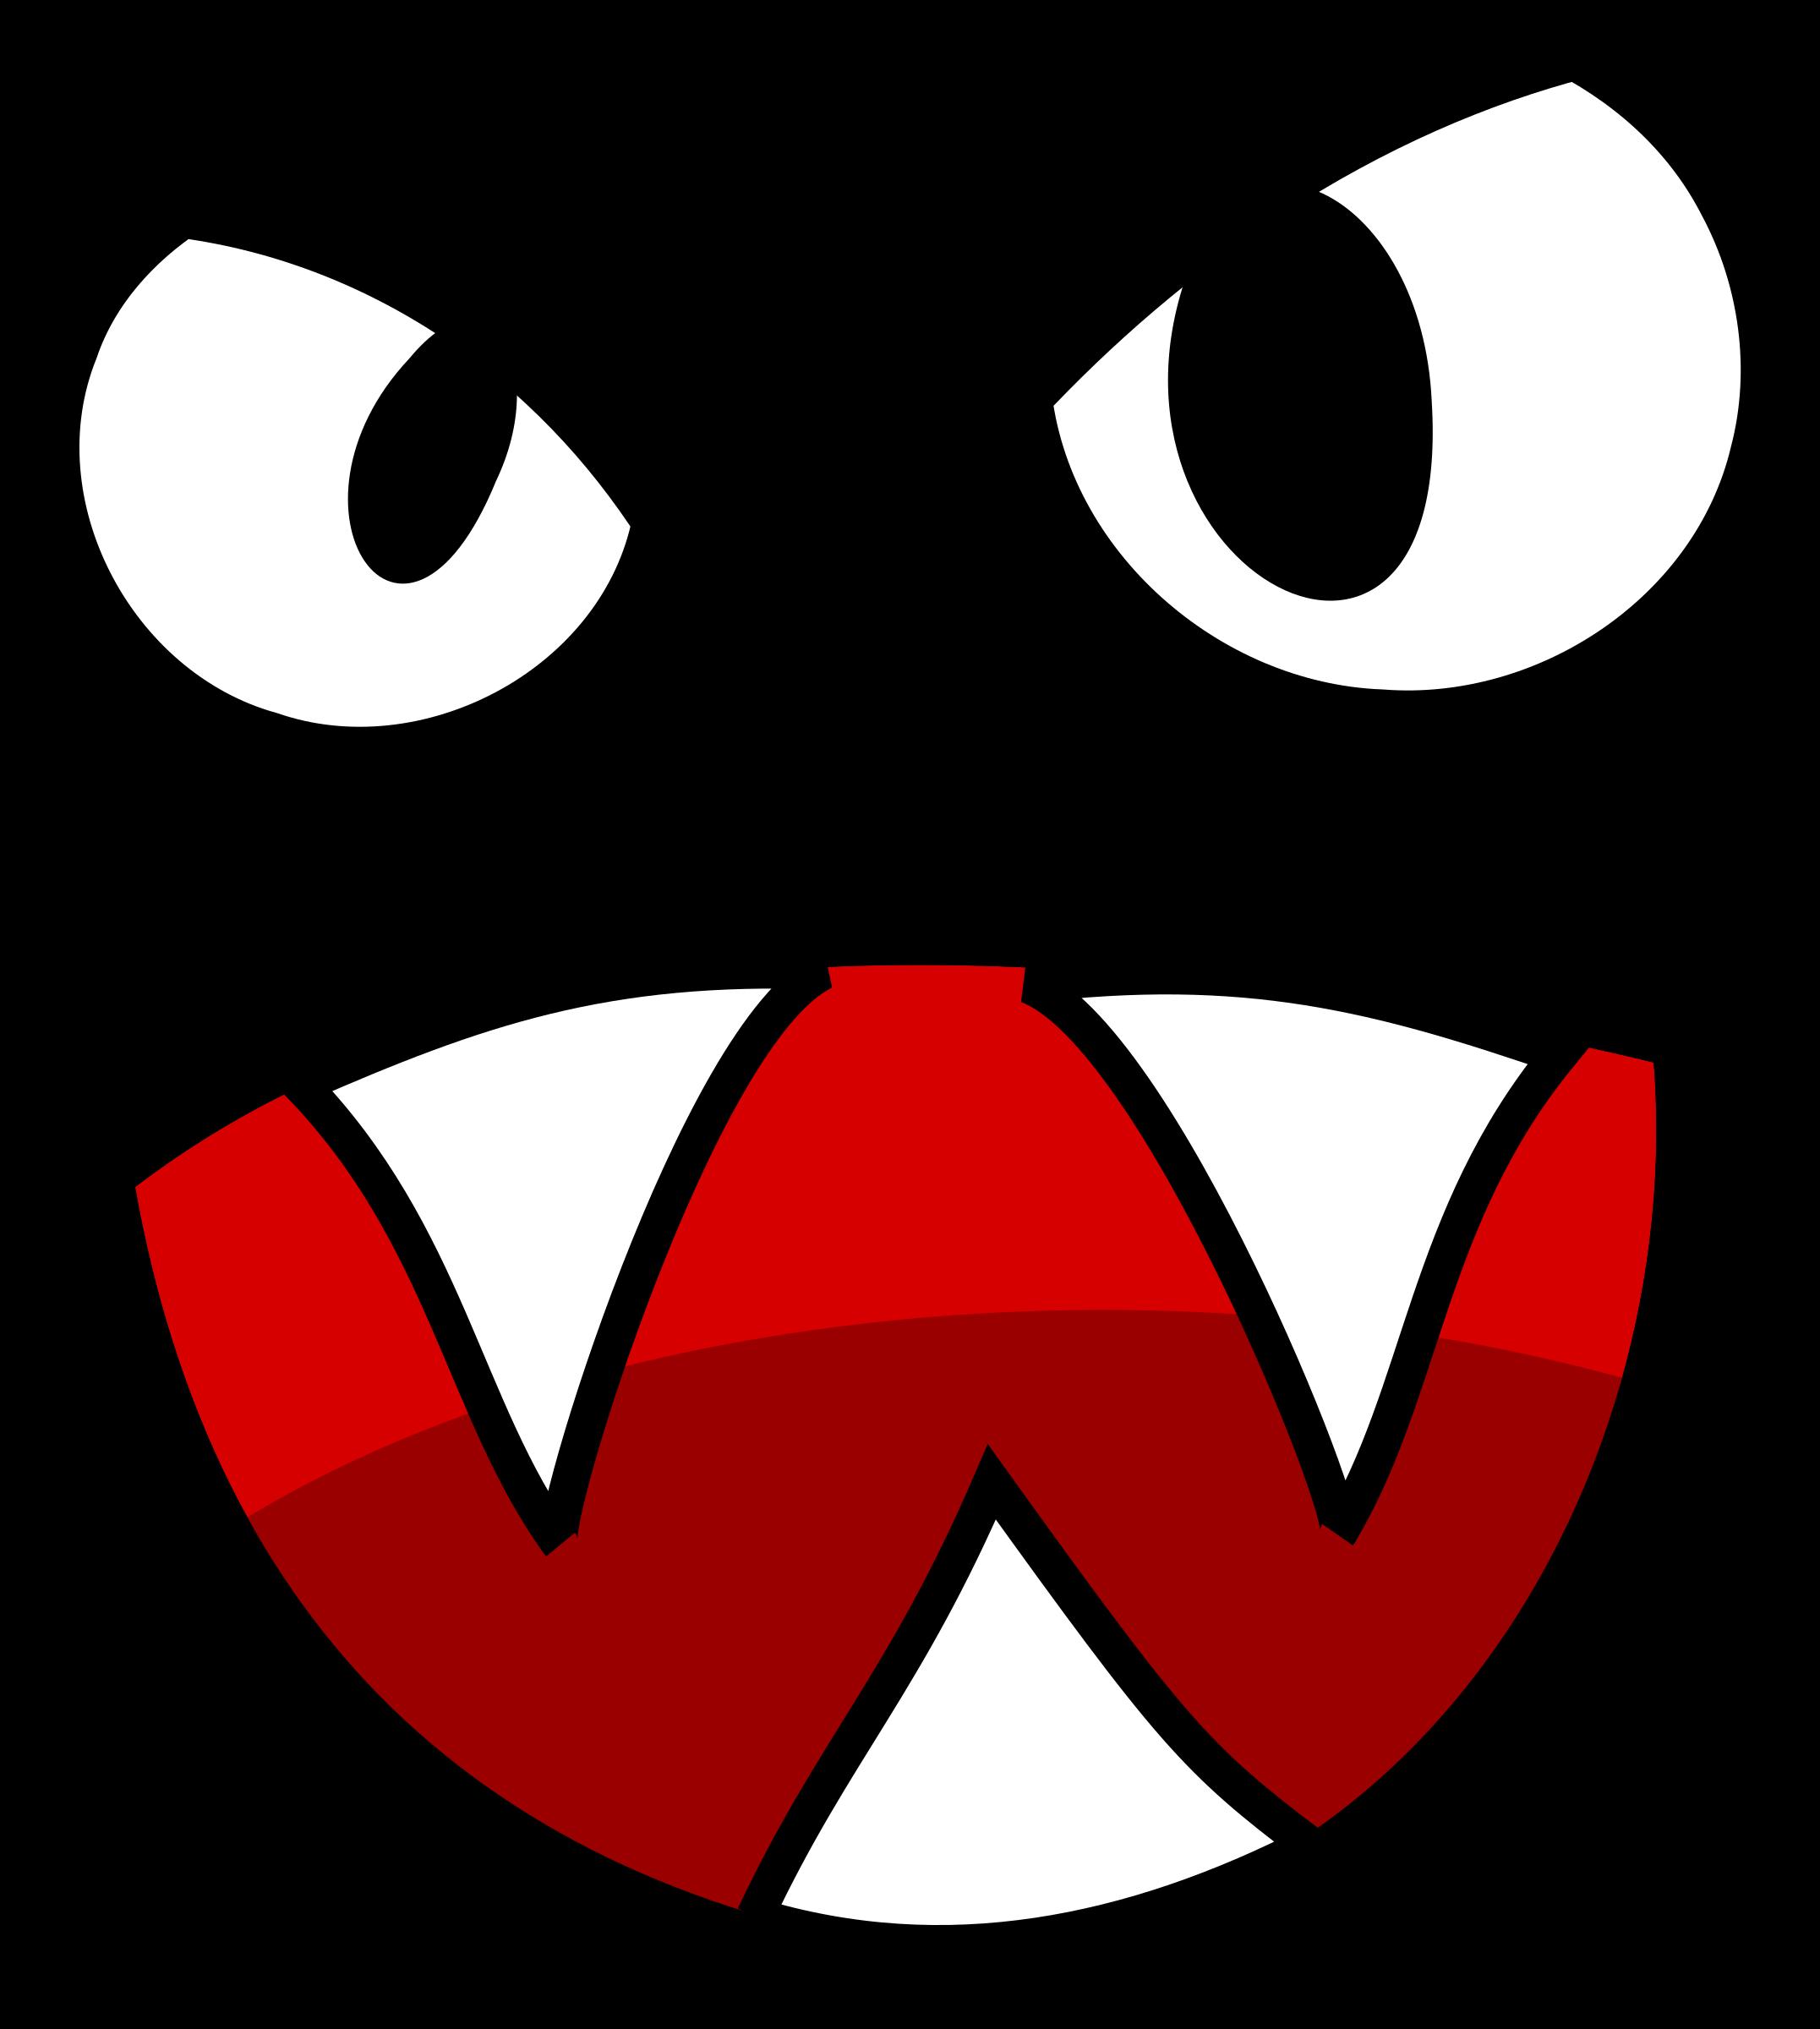 Monster face clipart.